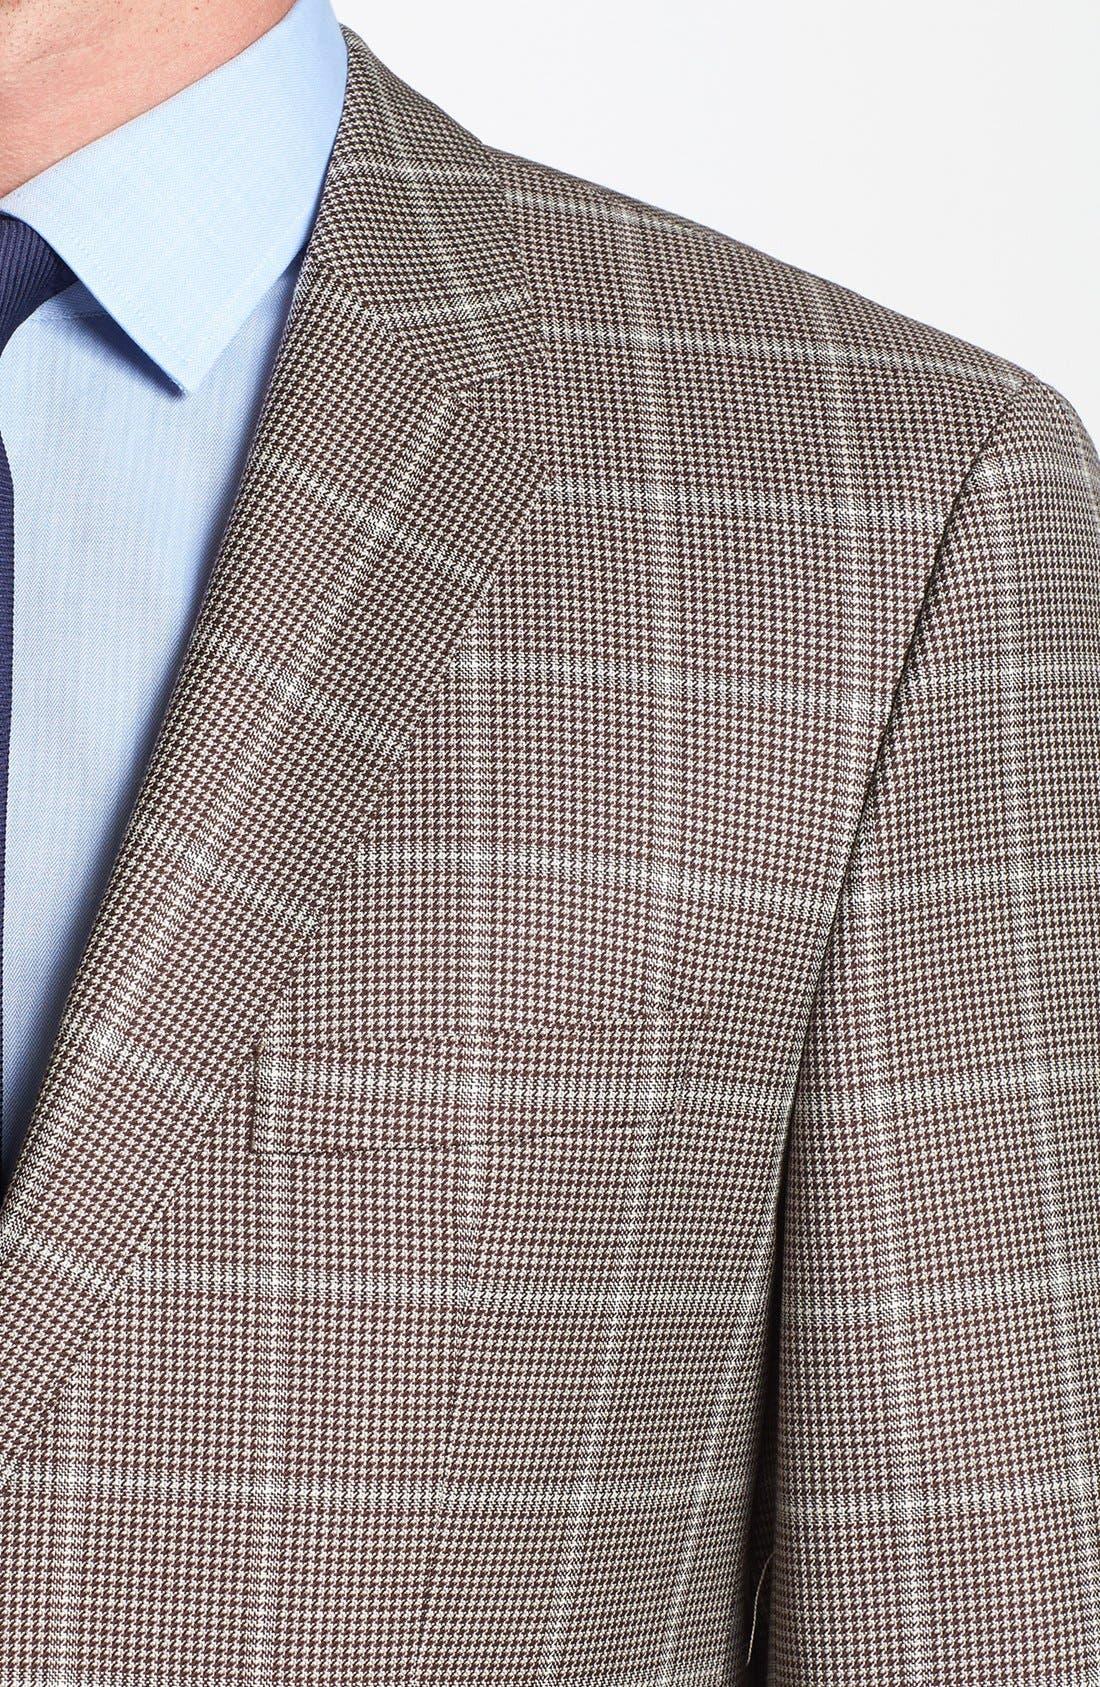 Alternate Image 3  - BOSS HUGO BOSS 'The Smith' Trim Fit Plaid Sportcoat